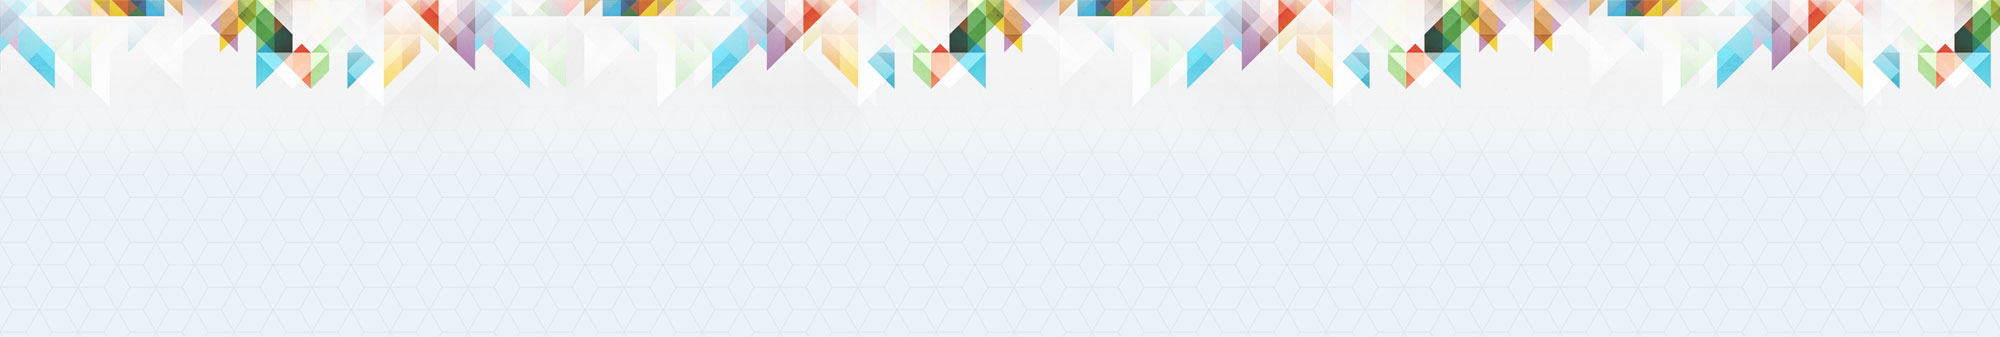 Air freshener sub banner image